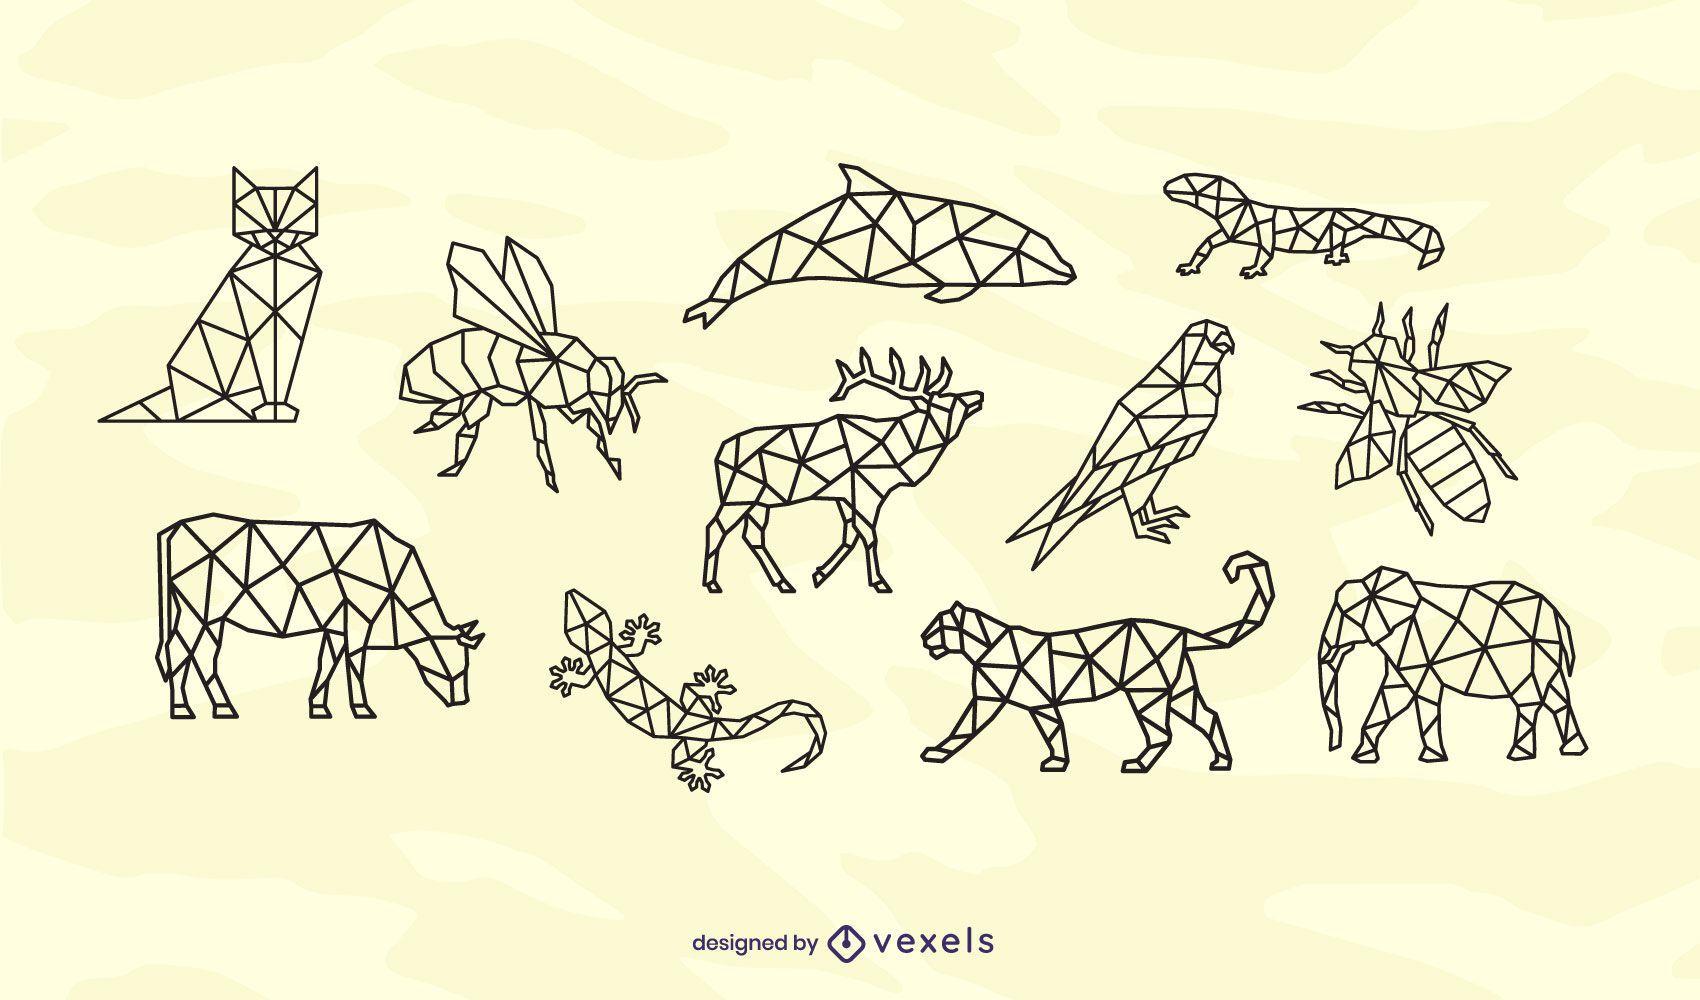 Polygonal animals stroke design set